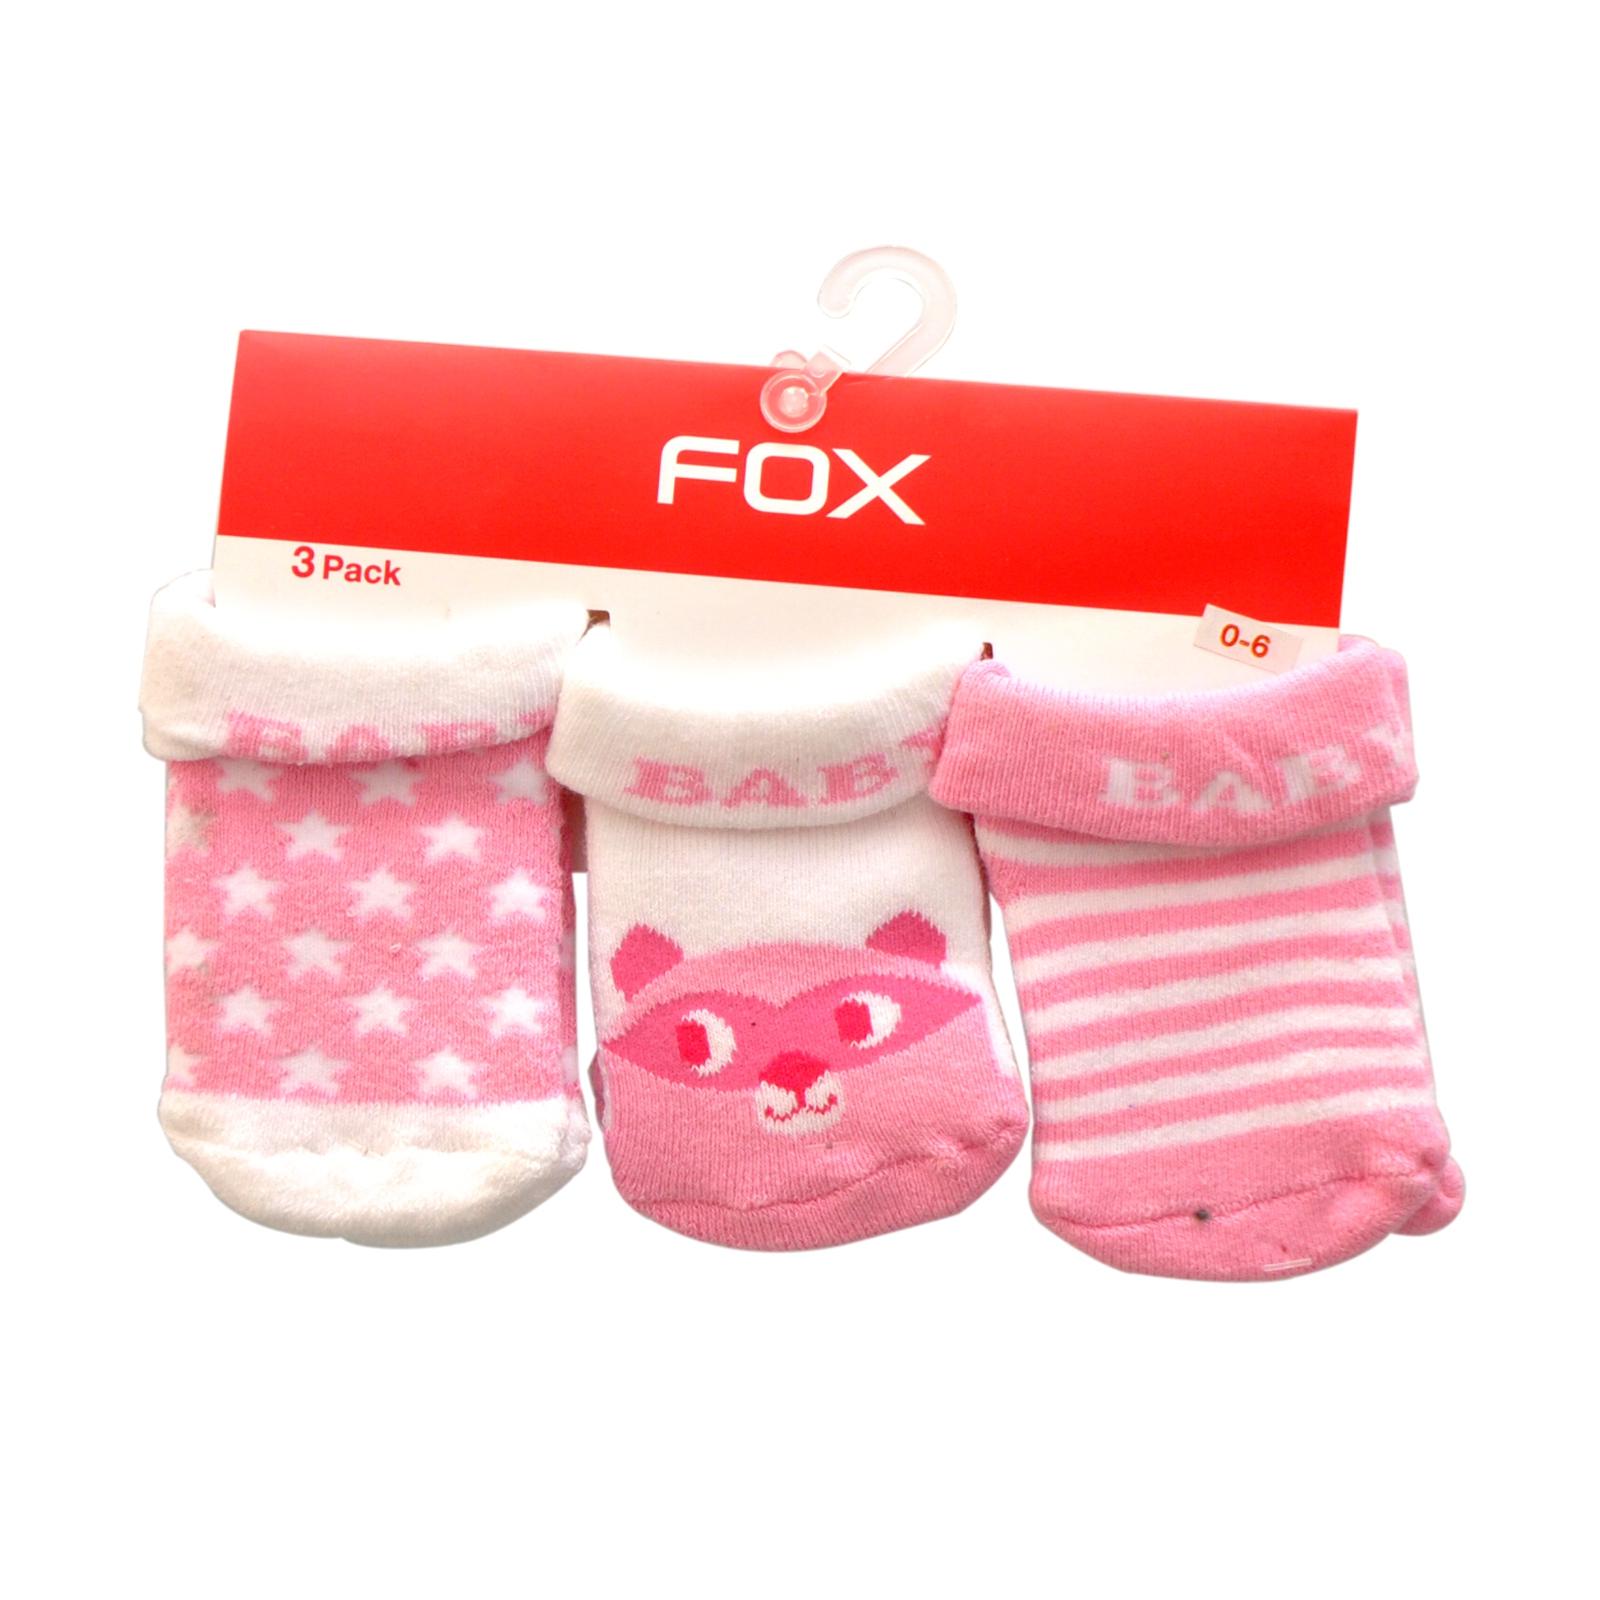 ����� FOX ���� ��� ������� ���� ������� � 0 �� 6 ���.